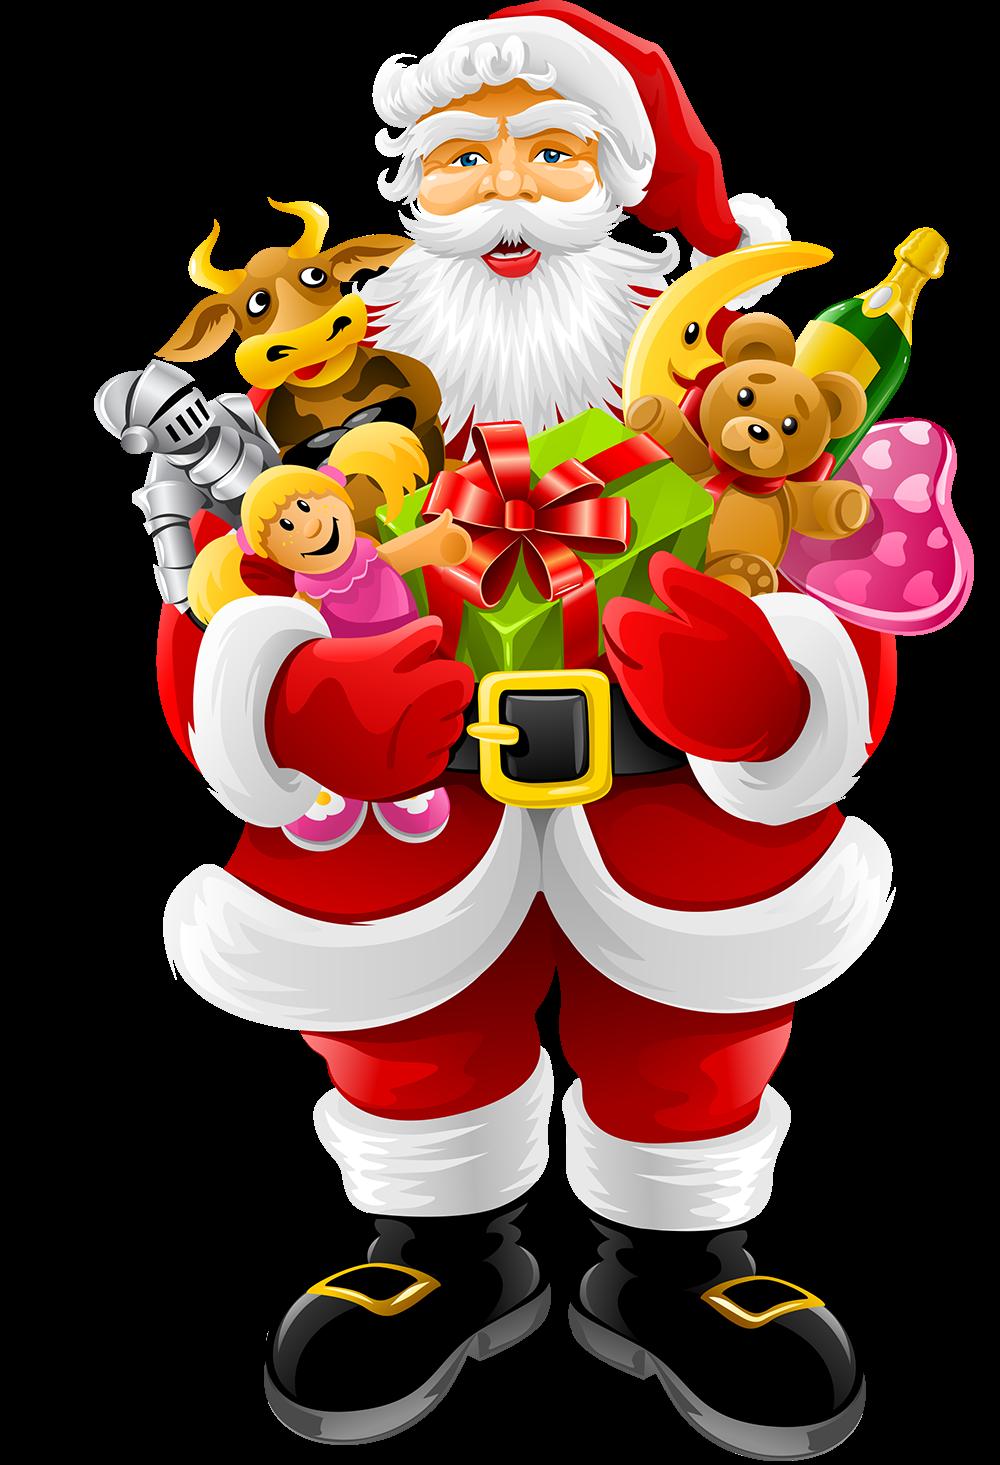 png images download download santa claus png images